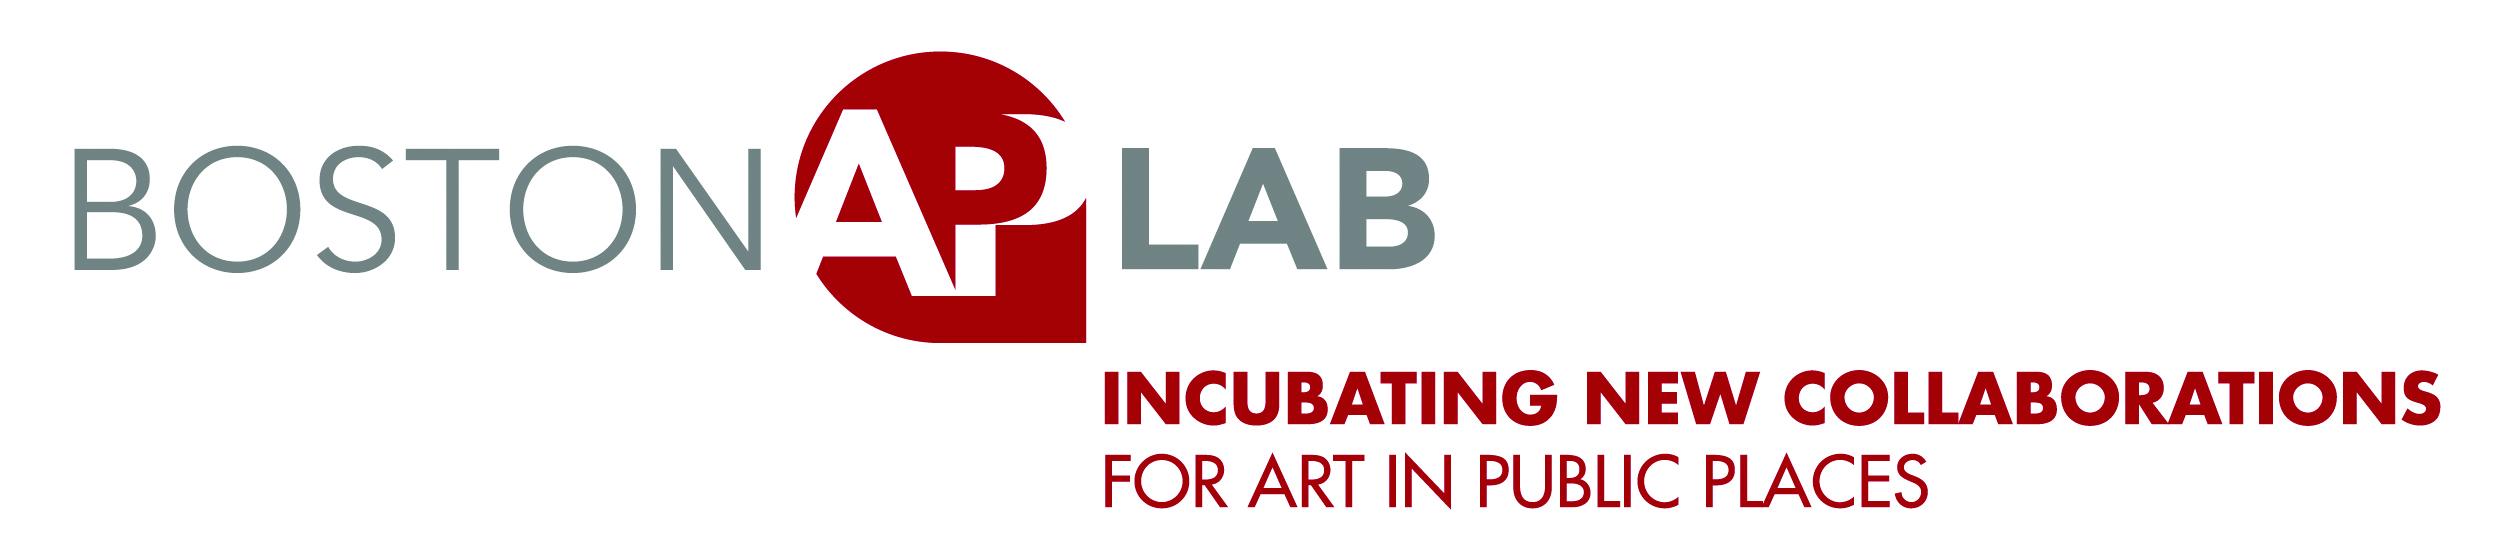 BostonAPP_Lab_Logo-CMYK.jpg